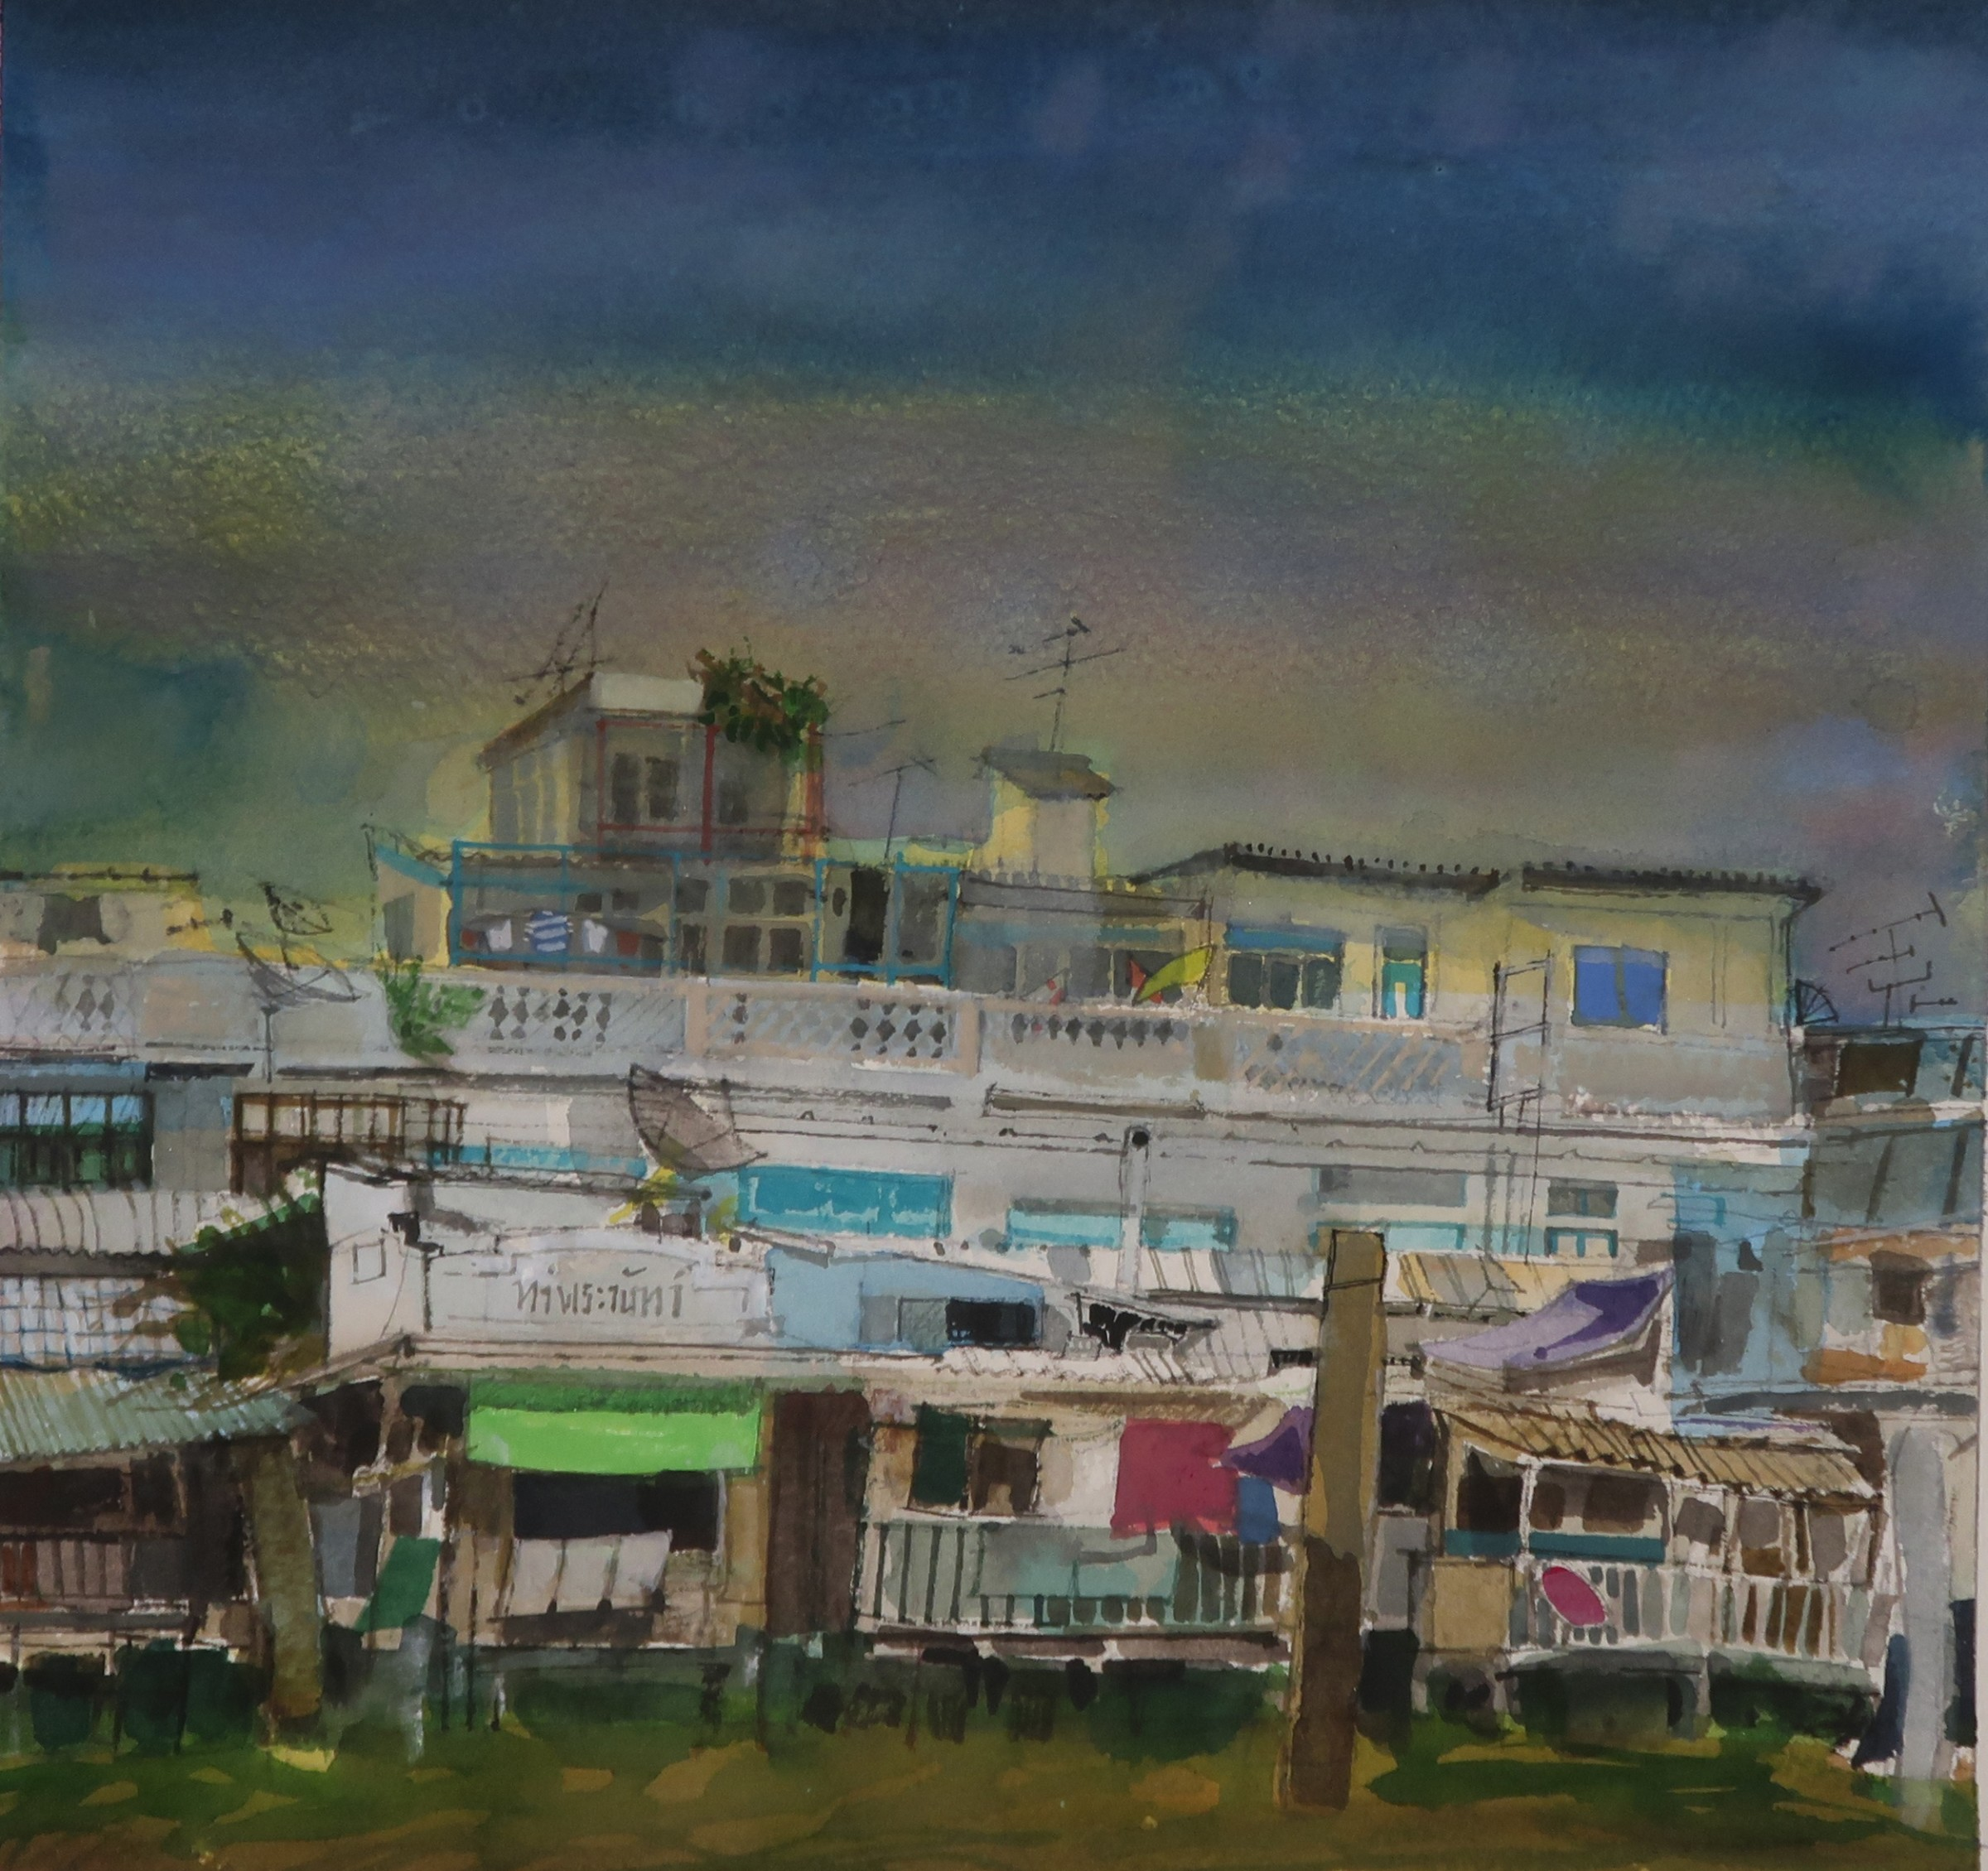 "<span class=""link fancybox-details-link""><a href=""/artists/96-peter-quinn/works/12463-peter-quinn-bangkok-riverside/"">View Detail Page</a></span><div class=""artist""><span class=""artist""><strong>Peter Quinn</strong></span></div><div class=""title""><em>Bangkok Riverside</em></div><div class=""medium"">watercolour on paper</div><div class=""dimensions"">Frame: 48 x 51 cm<br /> Artwork: 33 x 35 cm</div><div class=""price"">£700.00</div>"